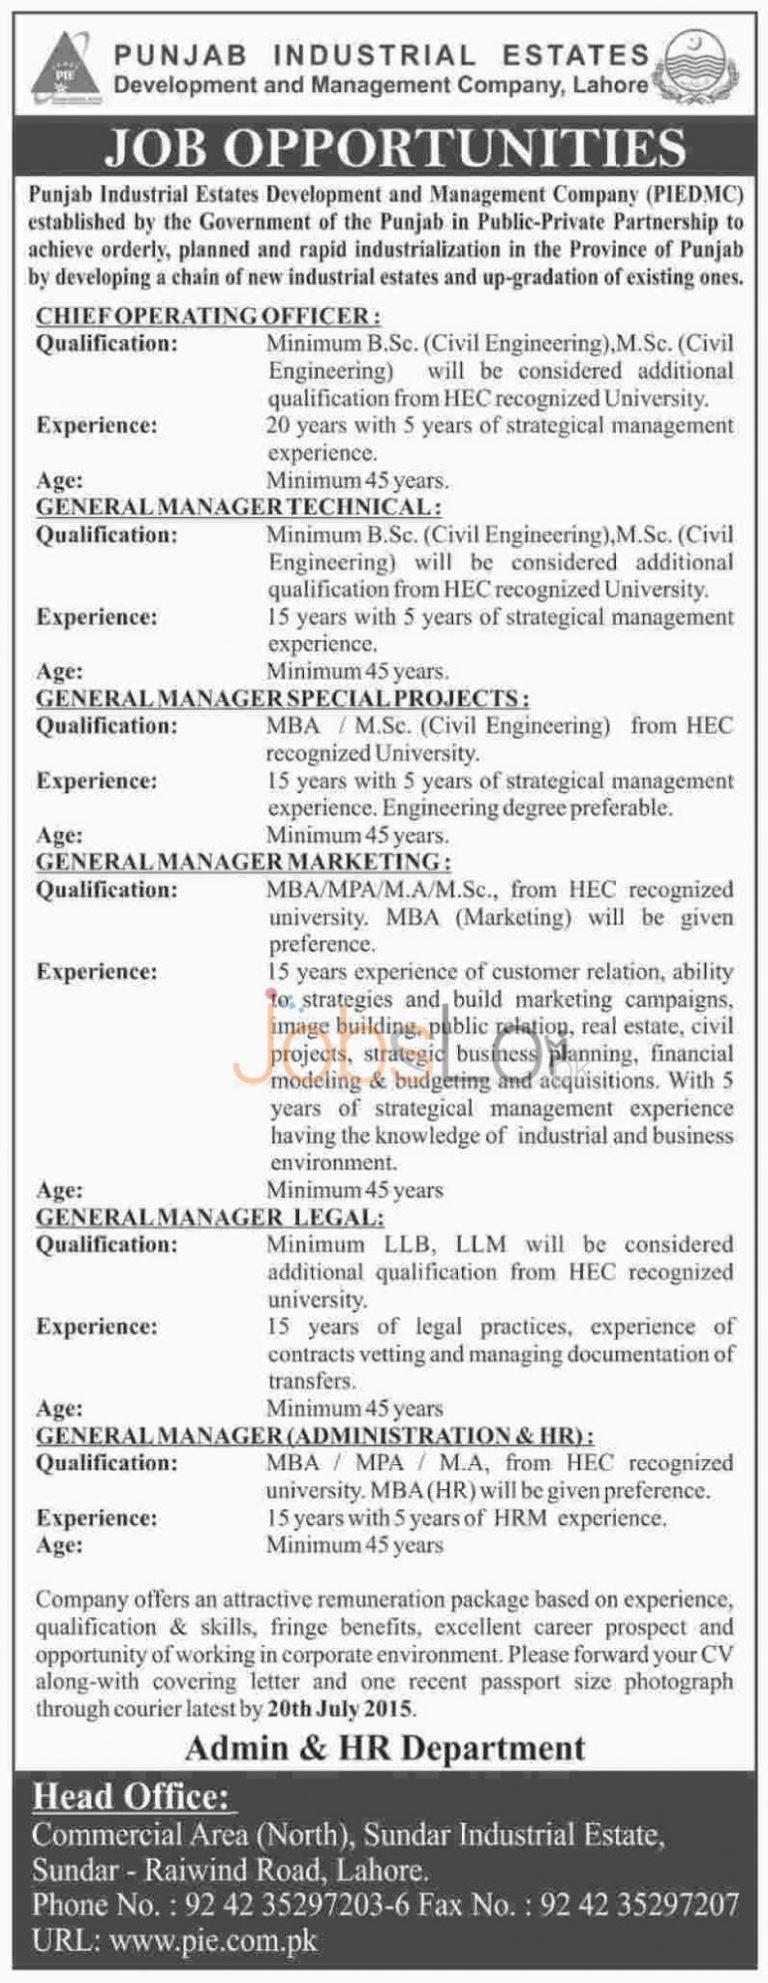 Punjab Industrial Estate Development & Management Company Lahore Jobs 2015